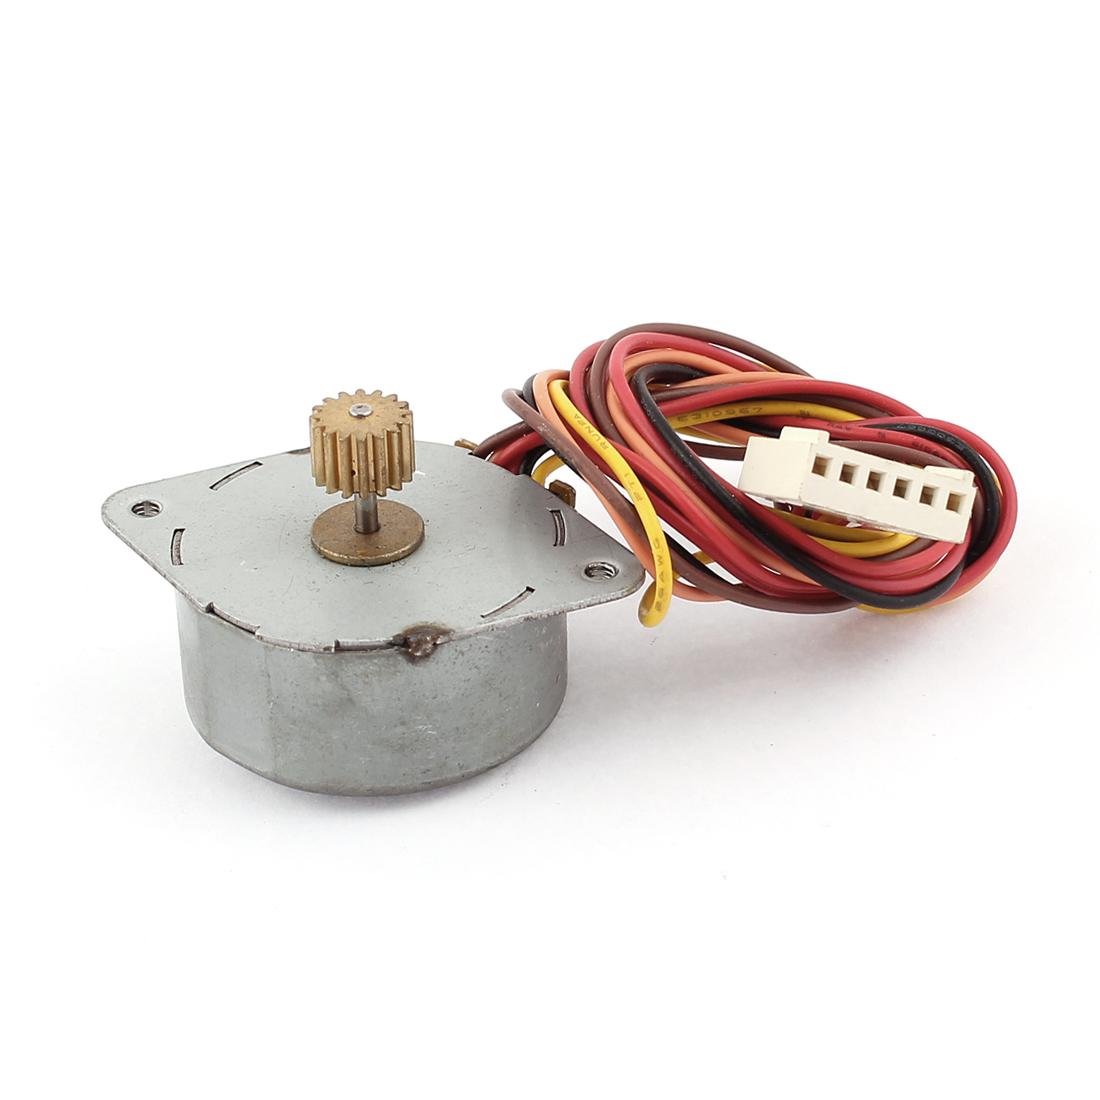 DC 3.5V 0.3mA 35mm Diameter Round Shaped 6 Wire Stepper Stepping Motor